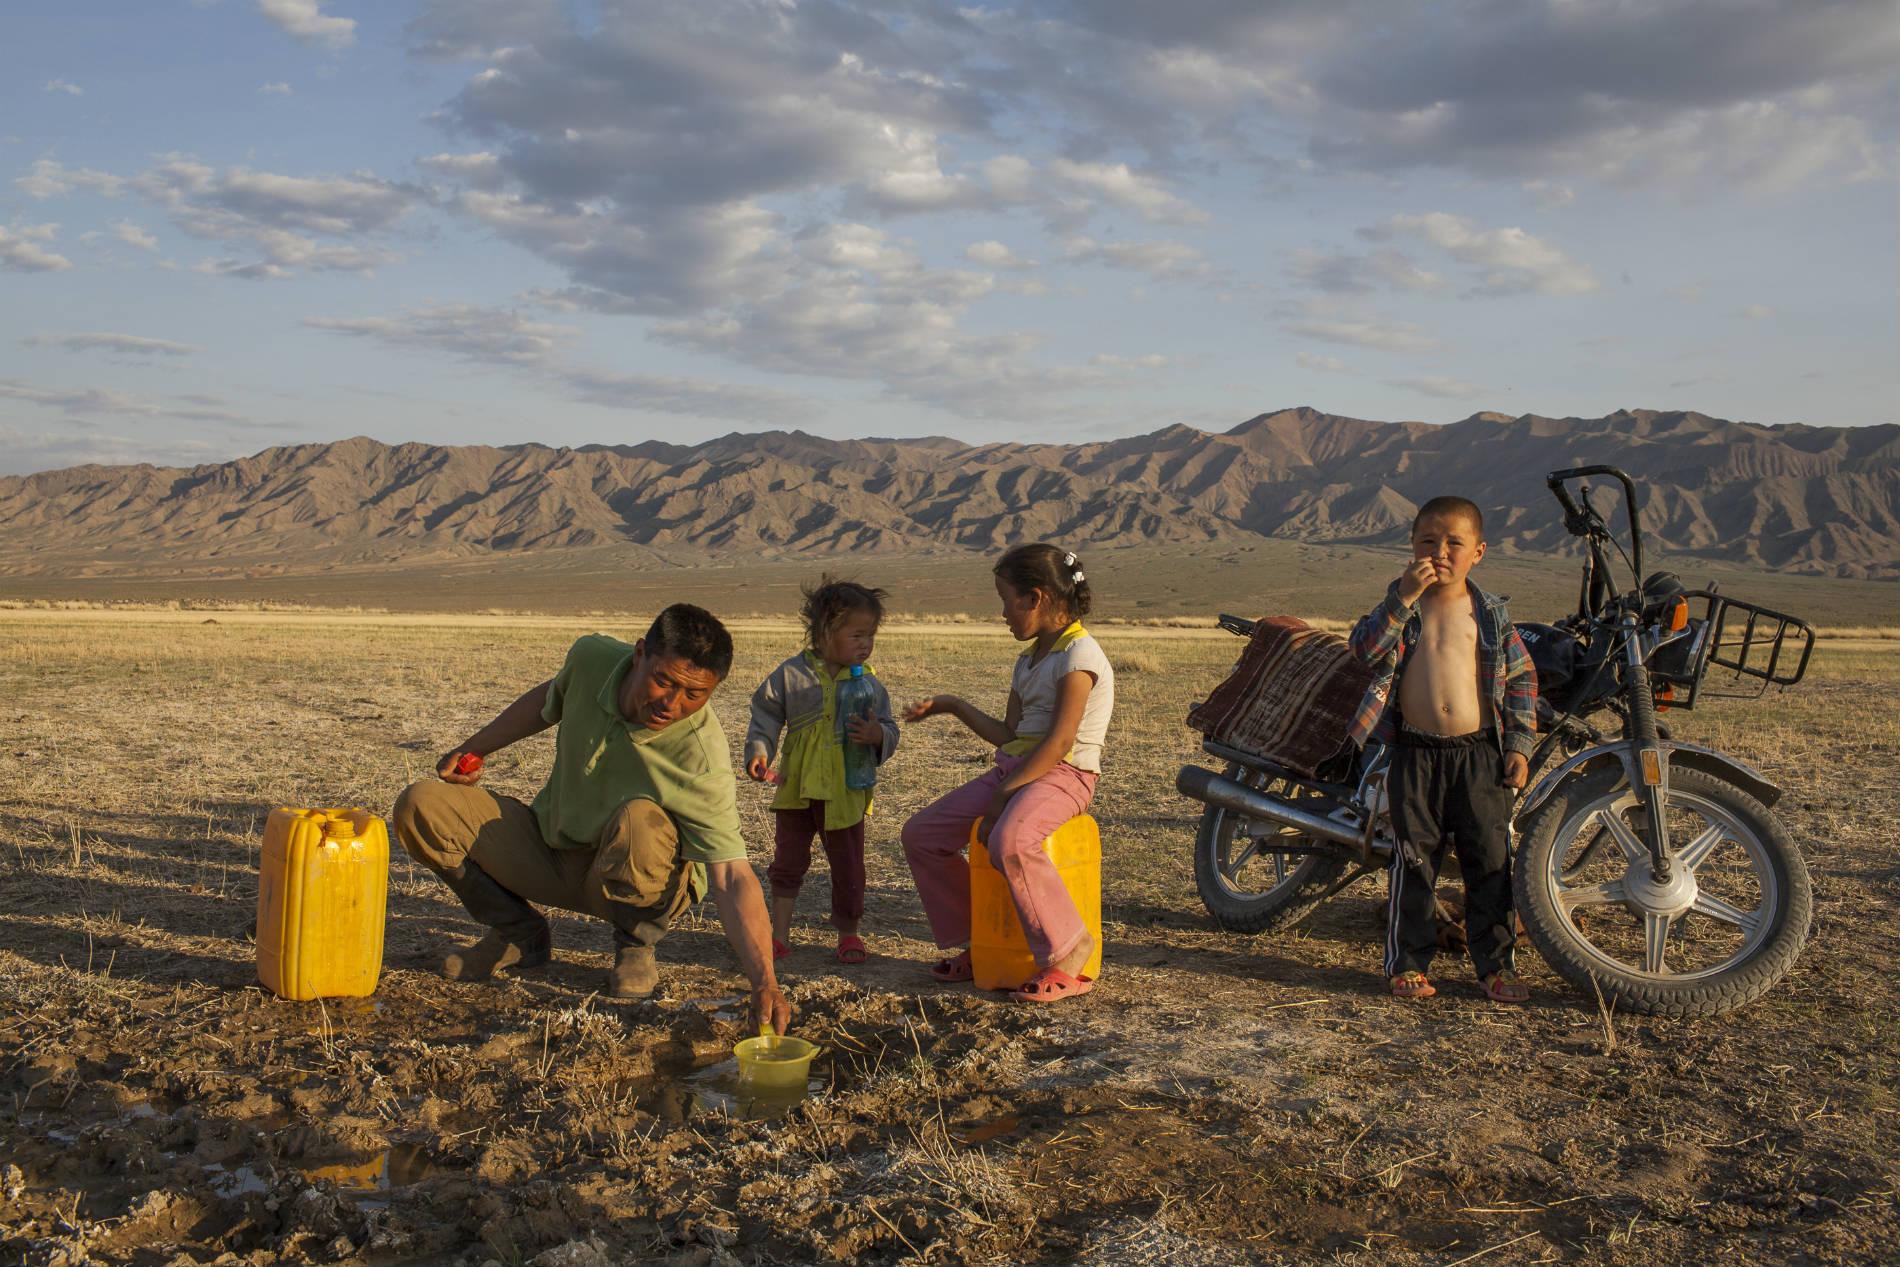 Nomads gathering water, Mongolia